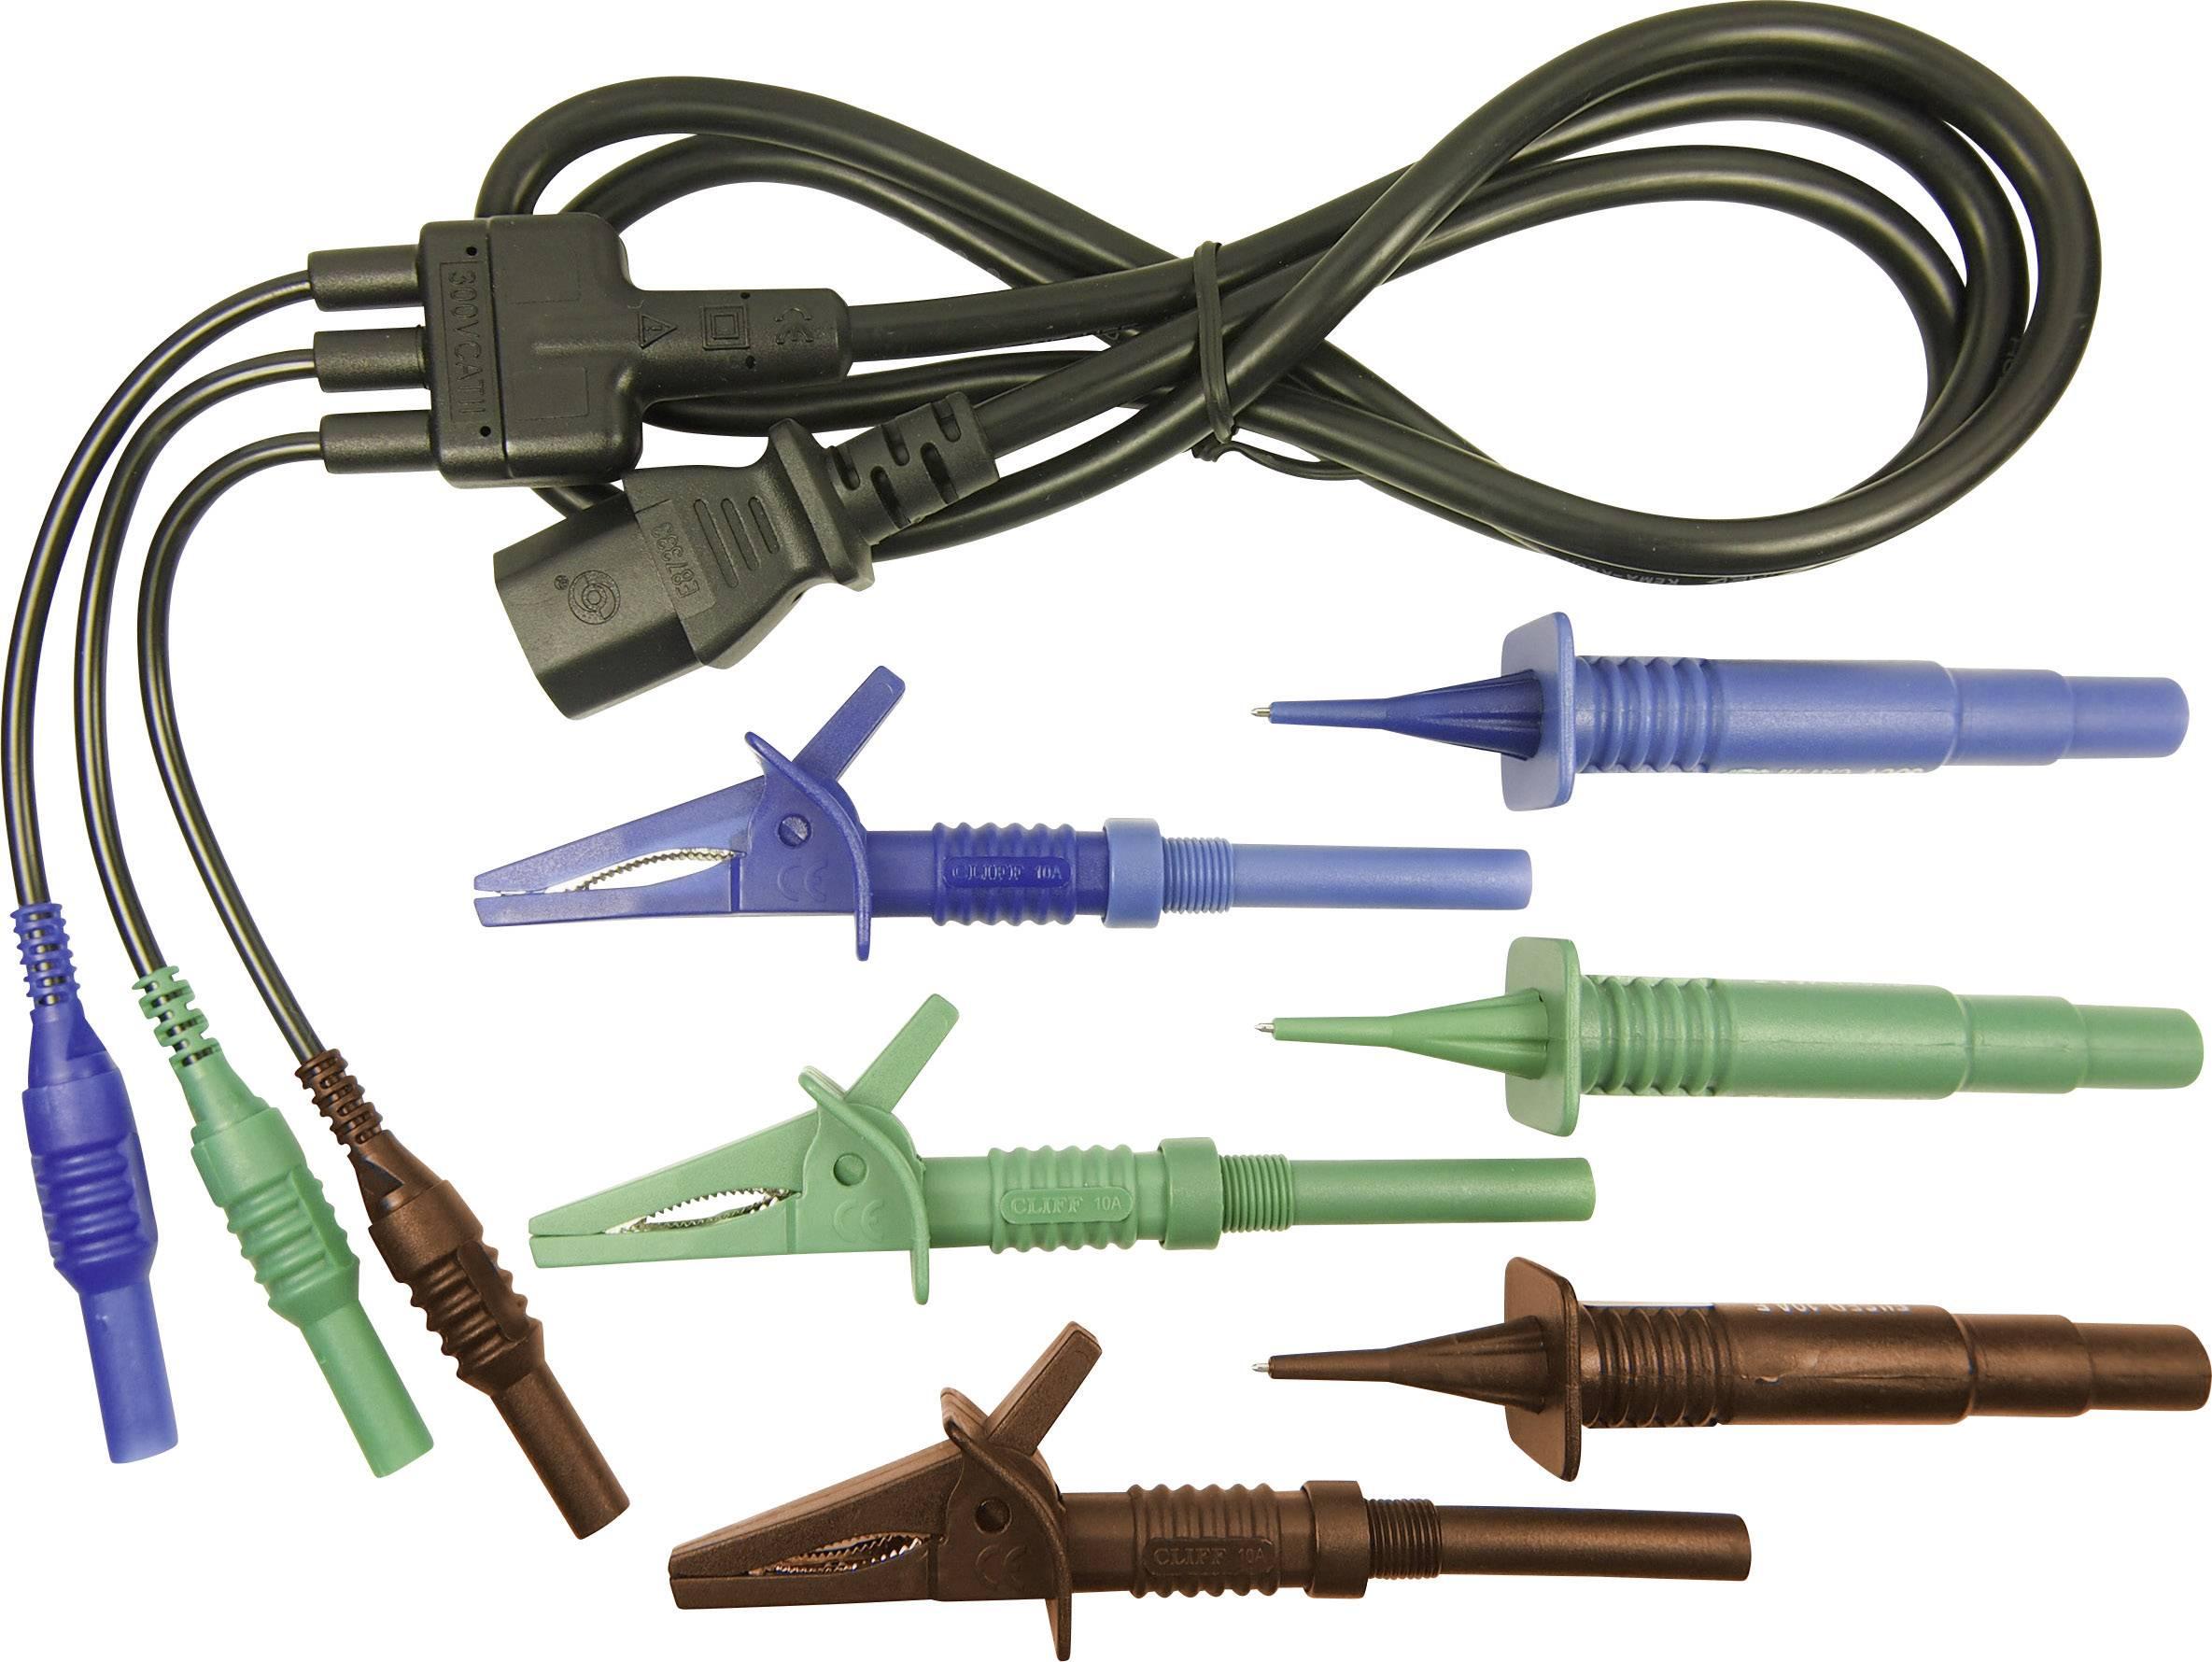 Merací kábel zástrčka 4 mm ⇔ IEC zásuvka C13 Cliff CIH29925, 1,5 m, modrá/zelená/hnedá